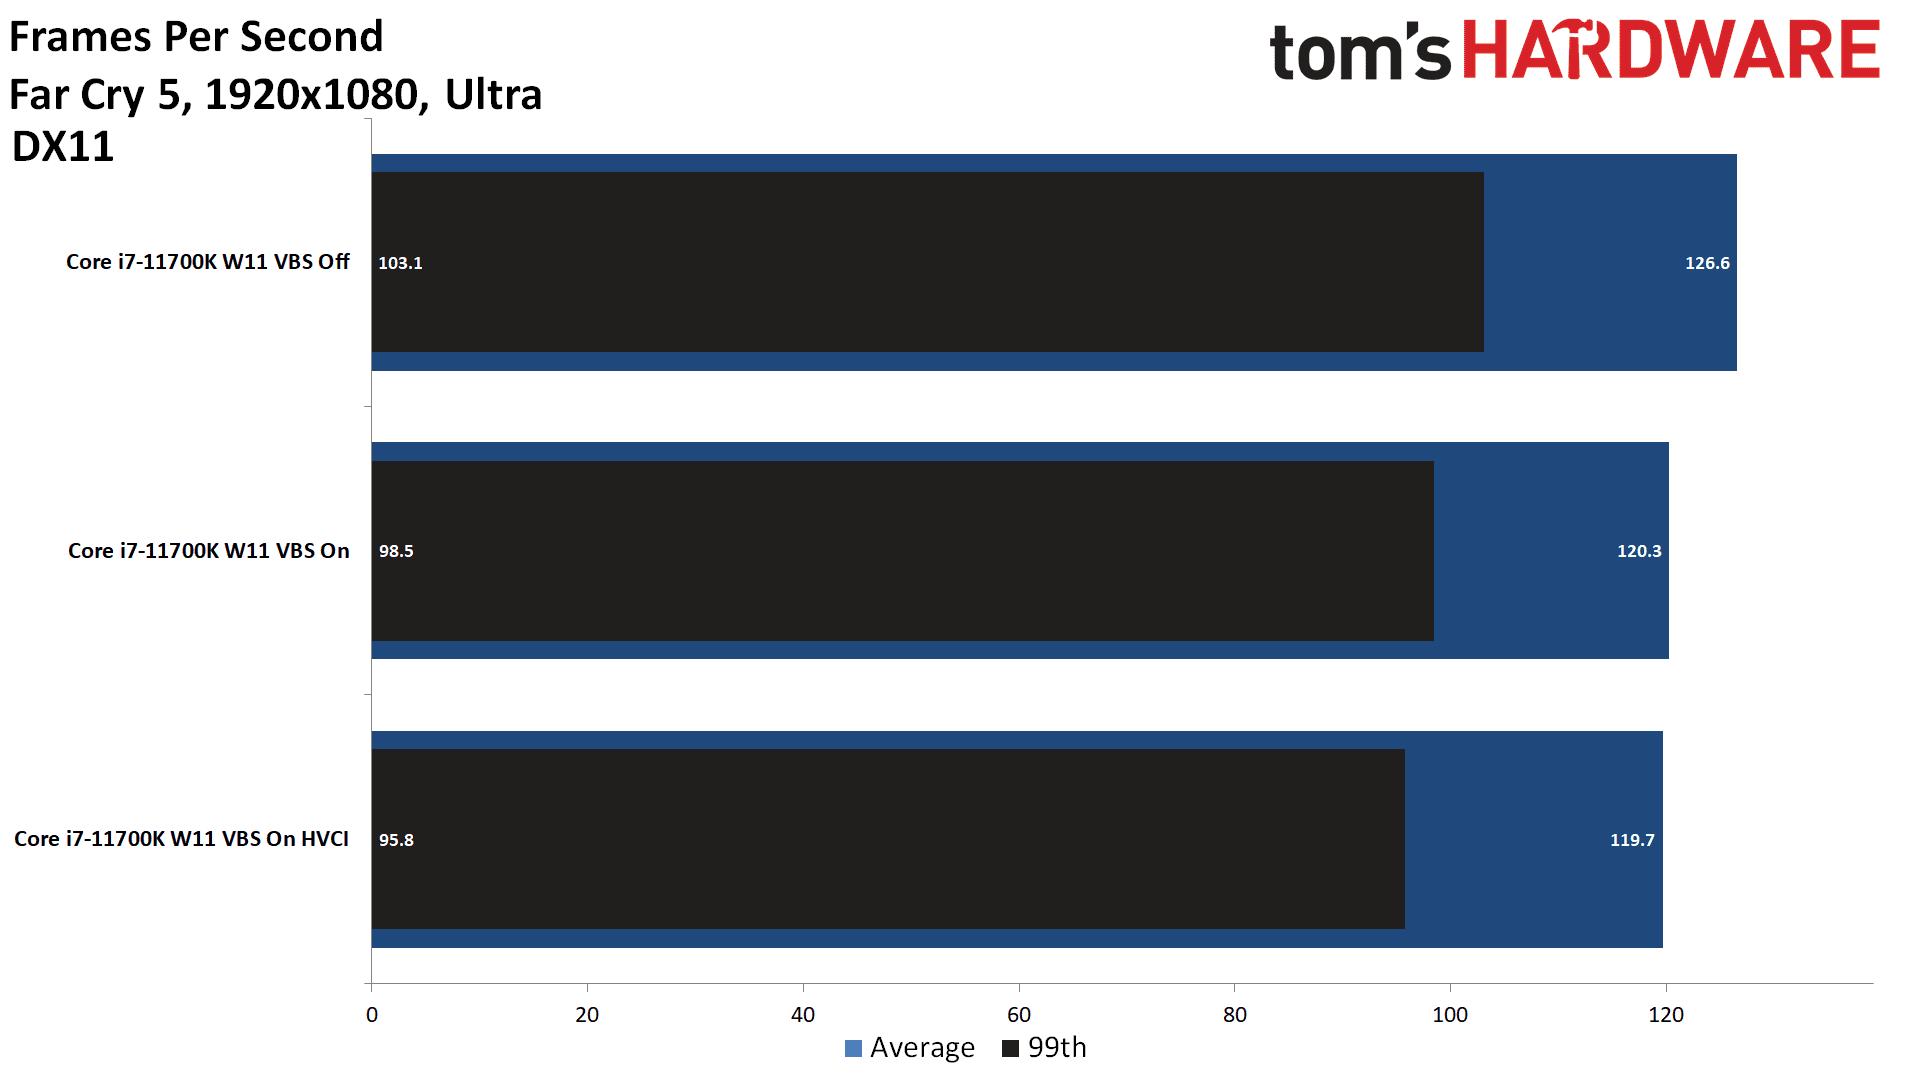 far cry 5 wydajność w windows 11 vbs on vs off na cpu intel 11 generacji